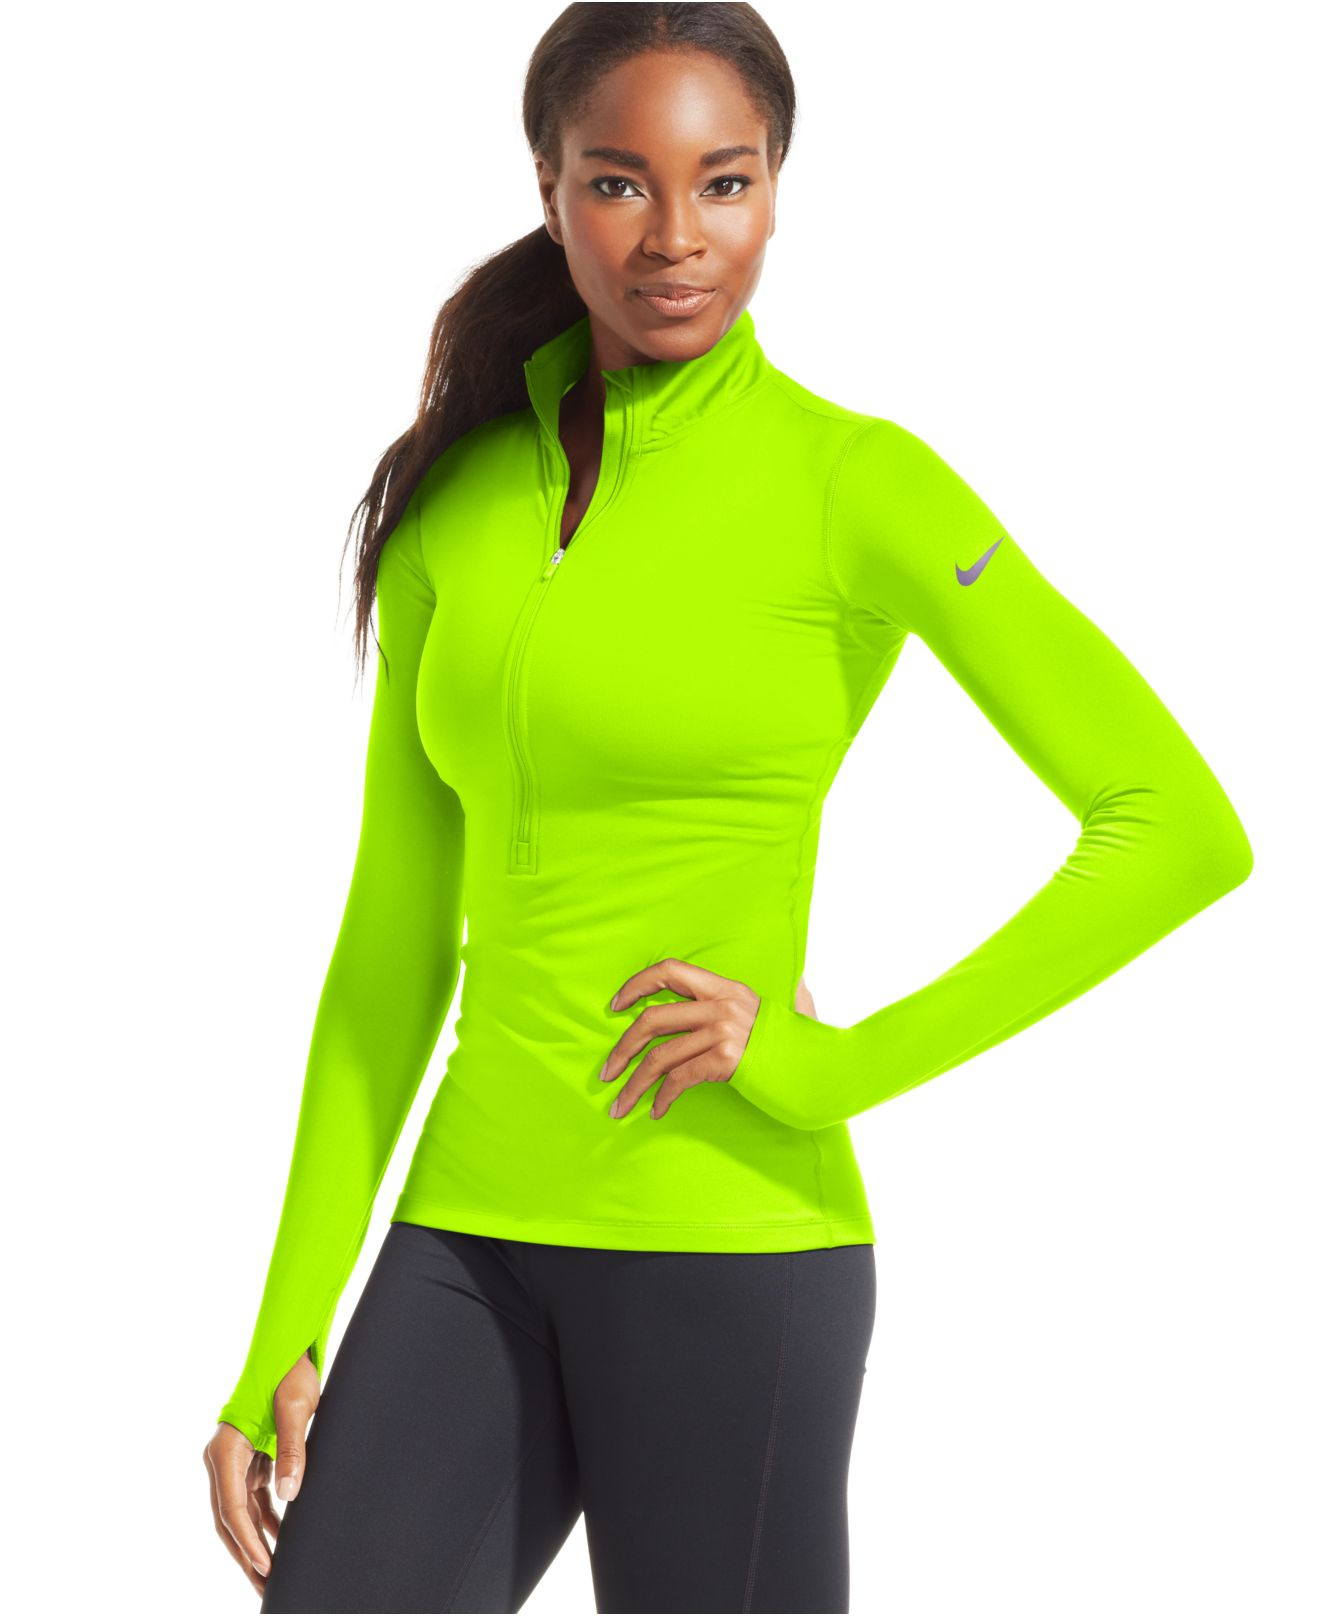 cheap for discount 20303 cba87 Lyst - Nike Pro Hyperwarm Half-Zip Dri-Fit Pullover in Green